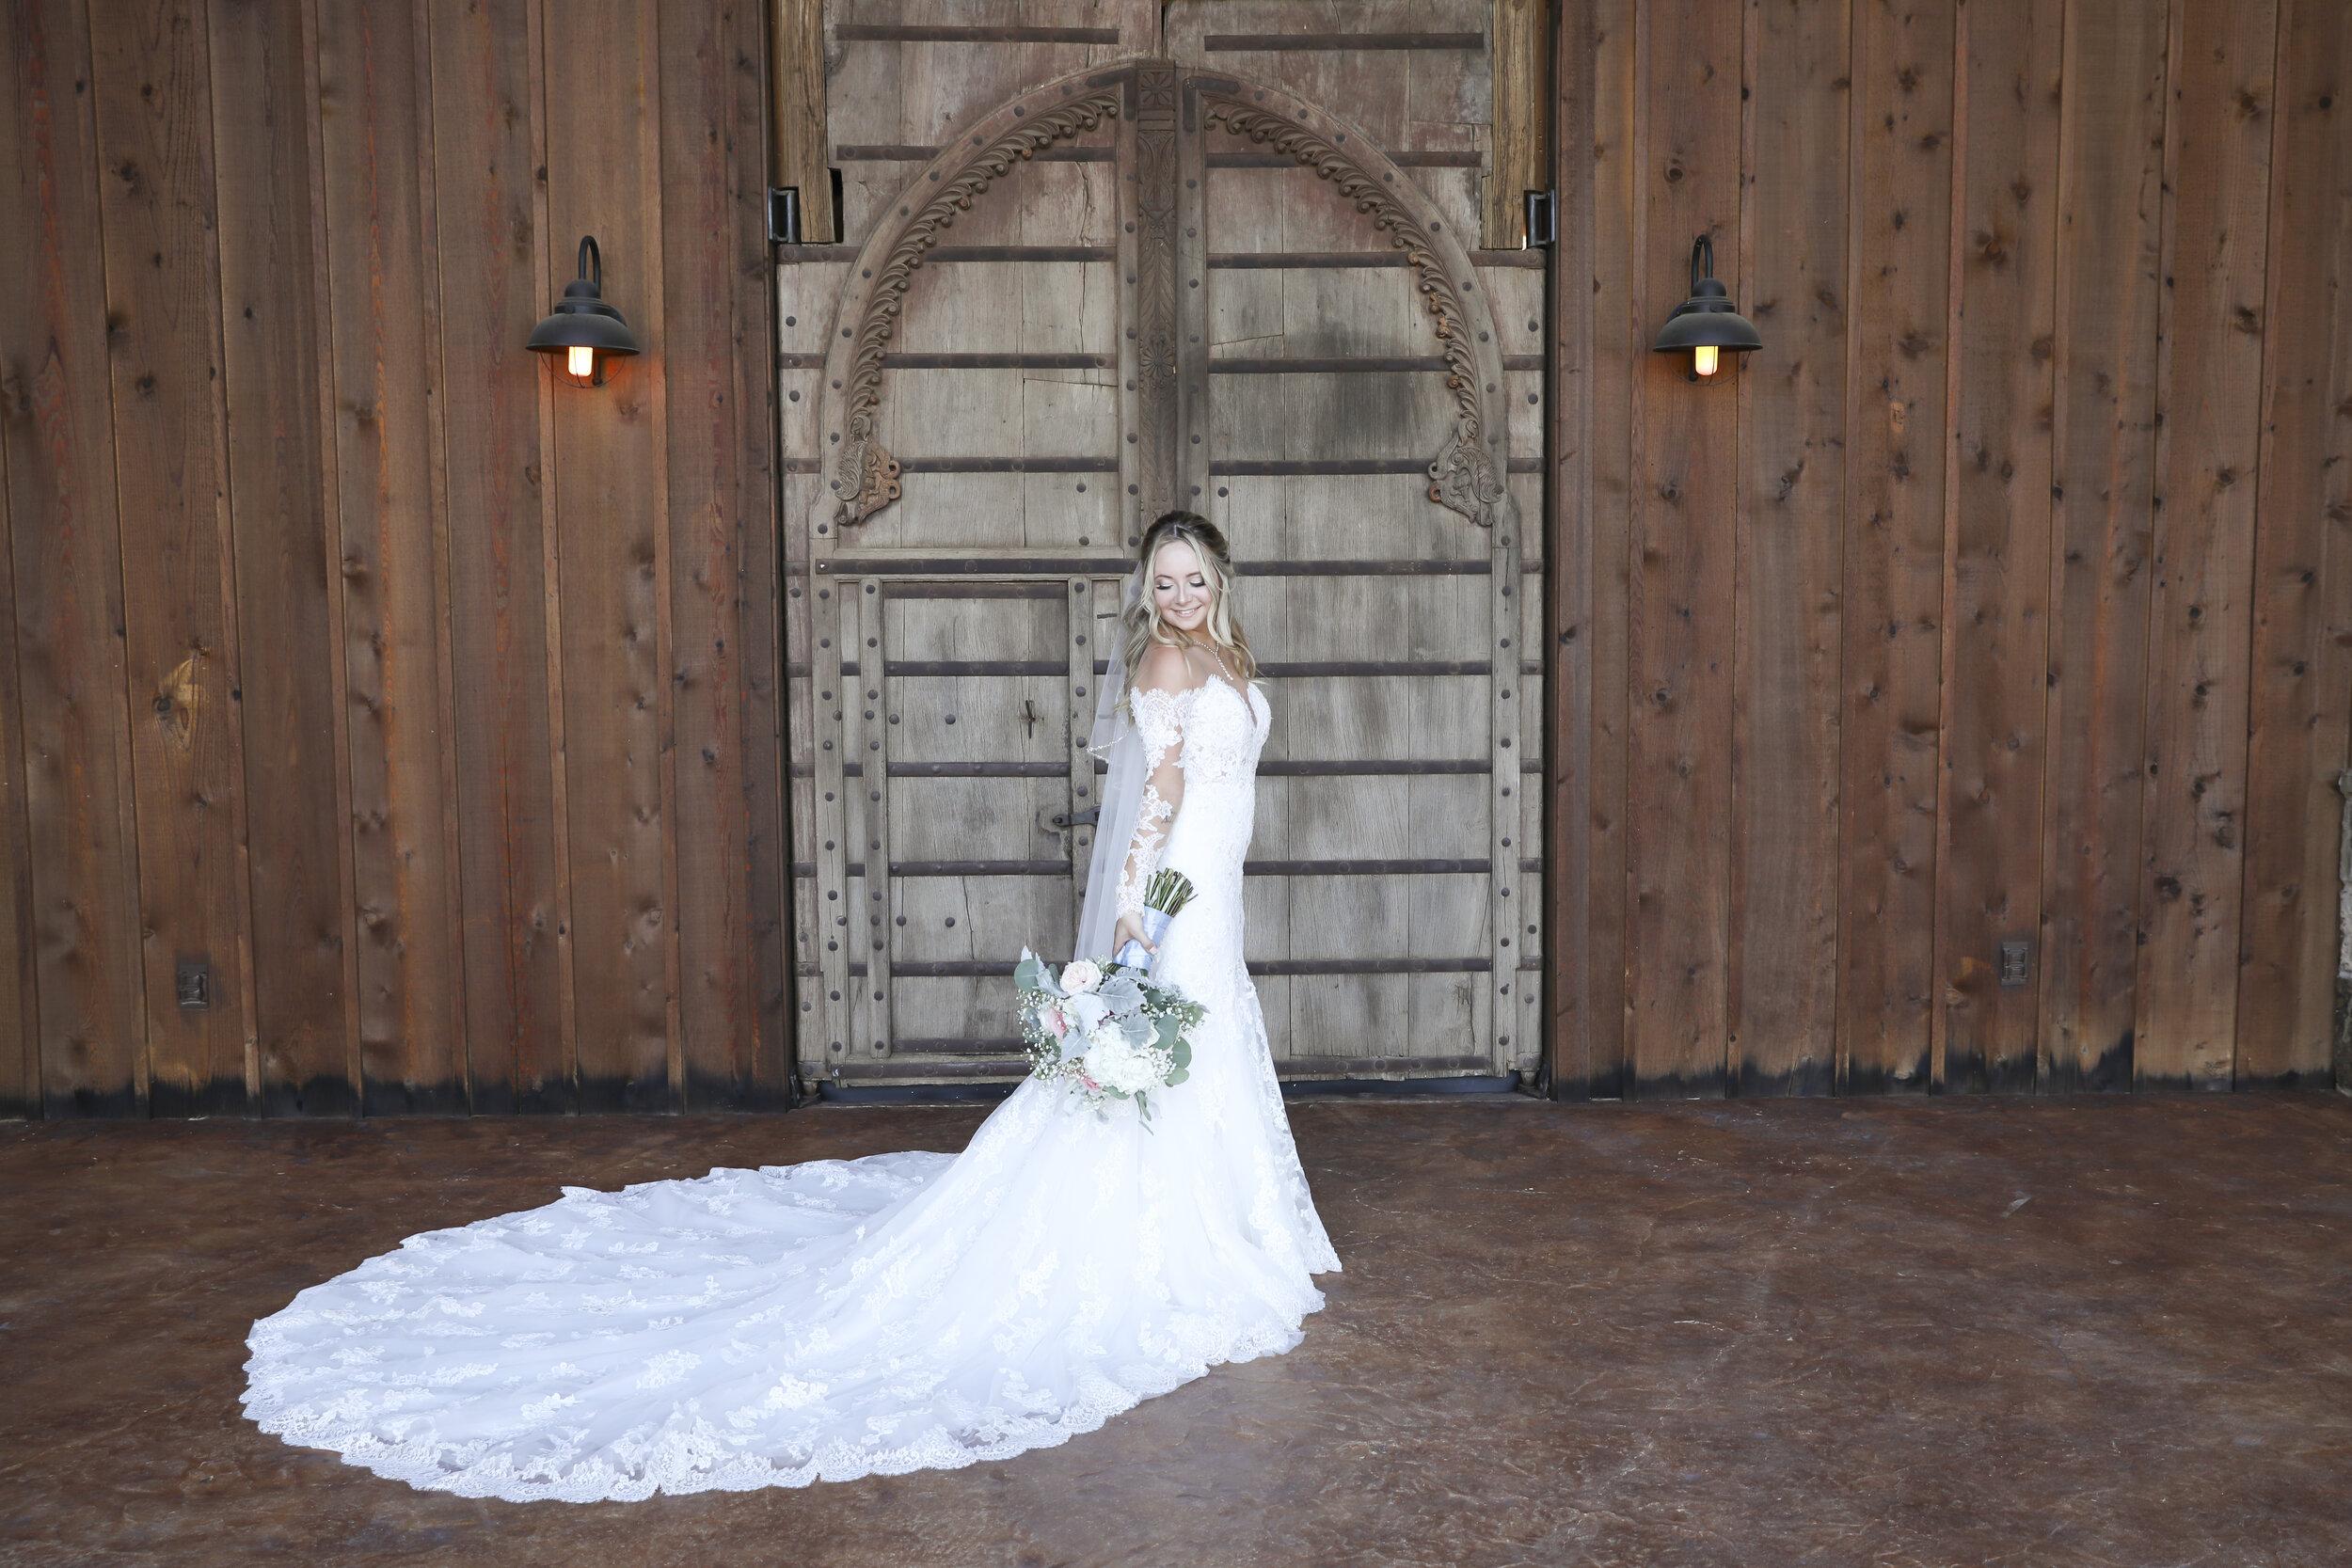 RandiMichelle_GannWedding_Bridal Portraits-18.jpg